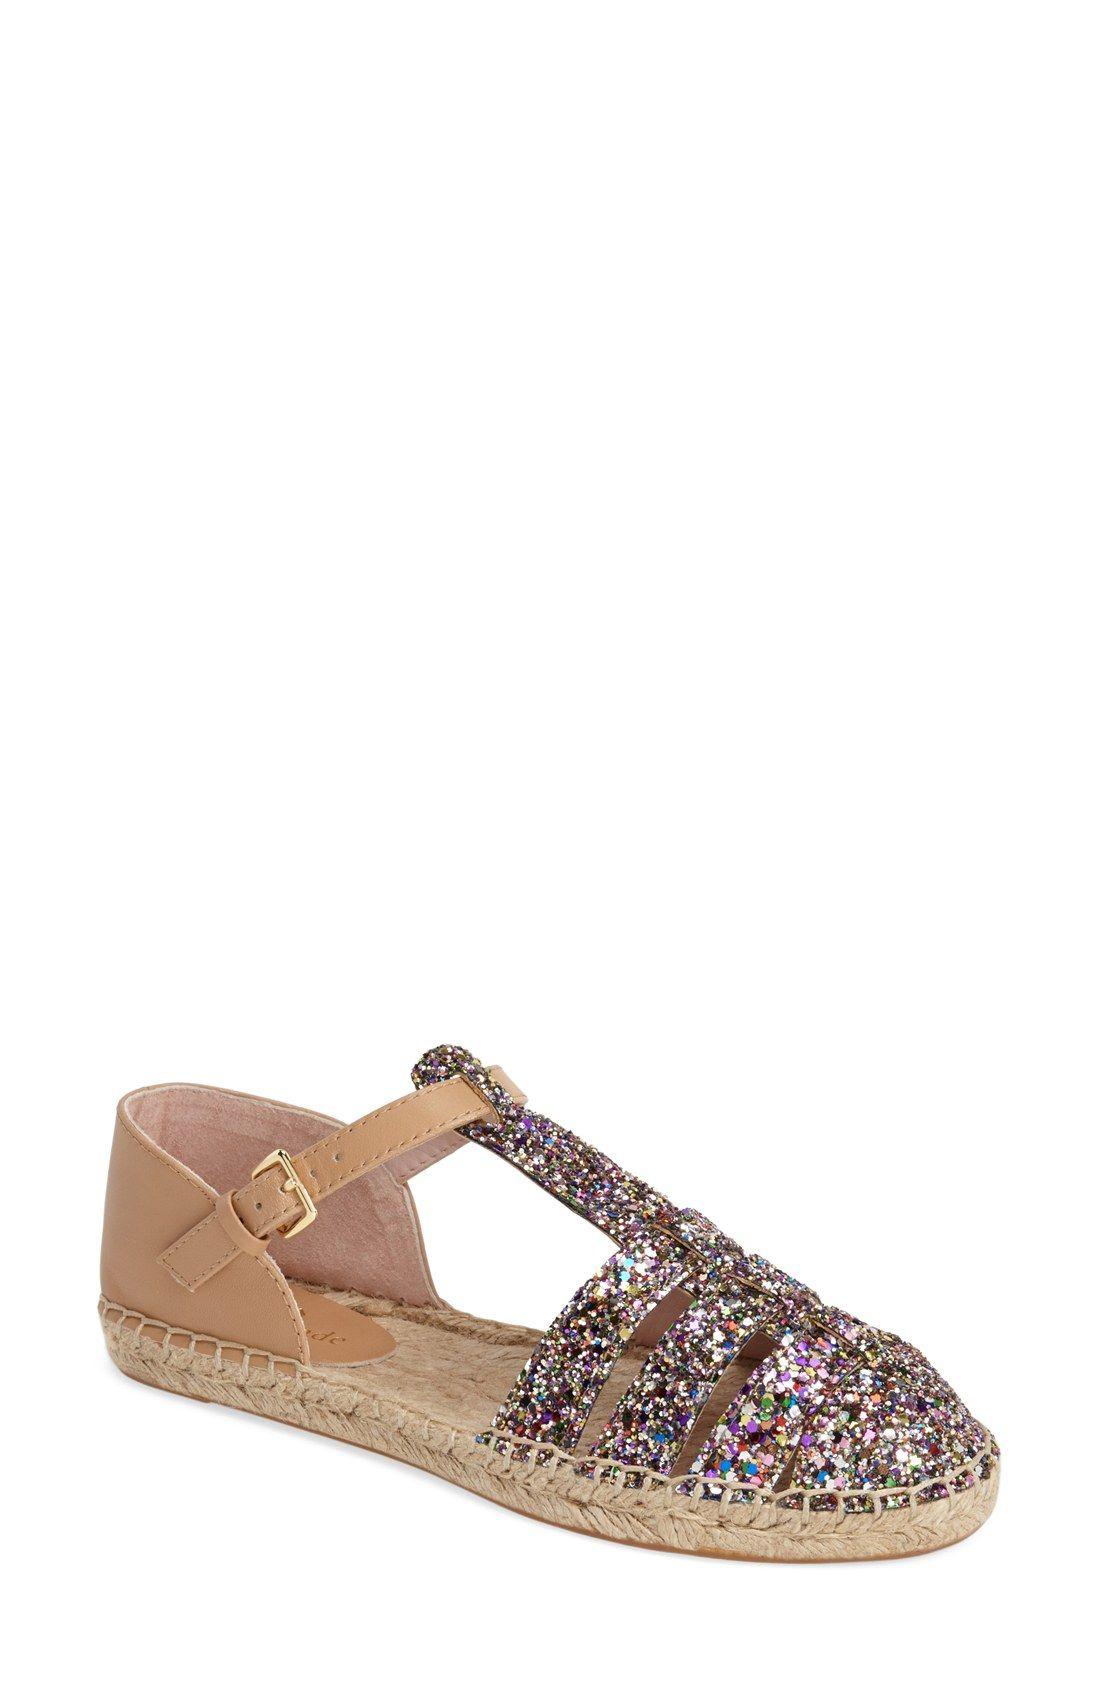 Kate Spade espadrille sandals sure